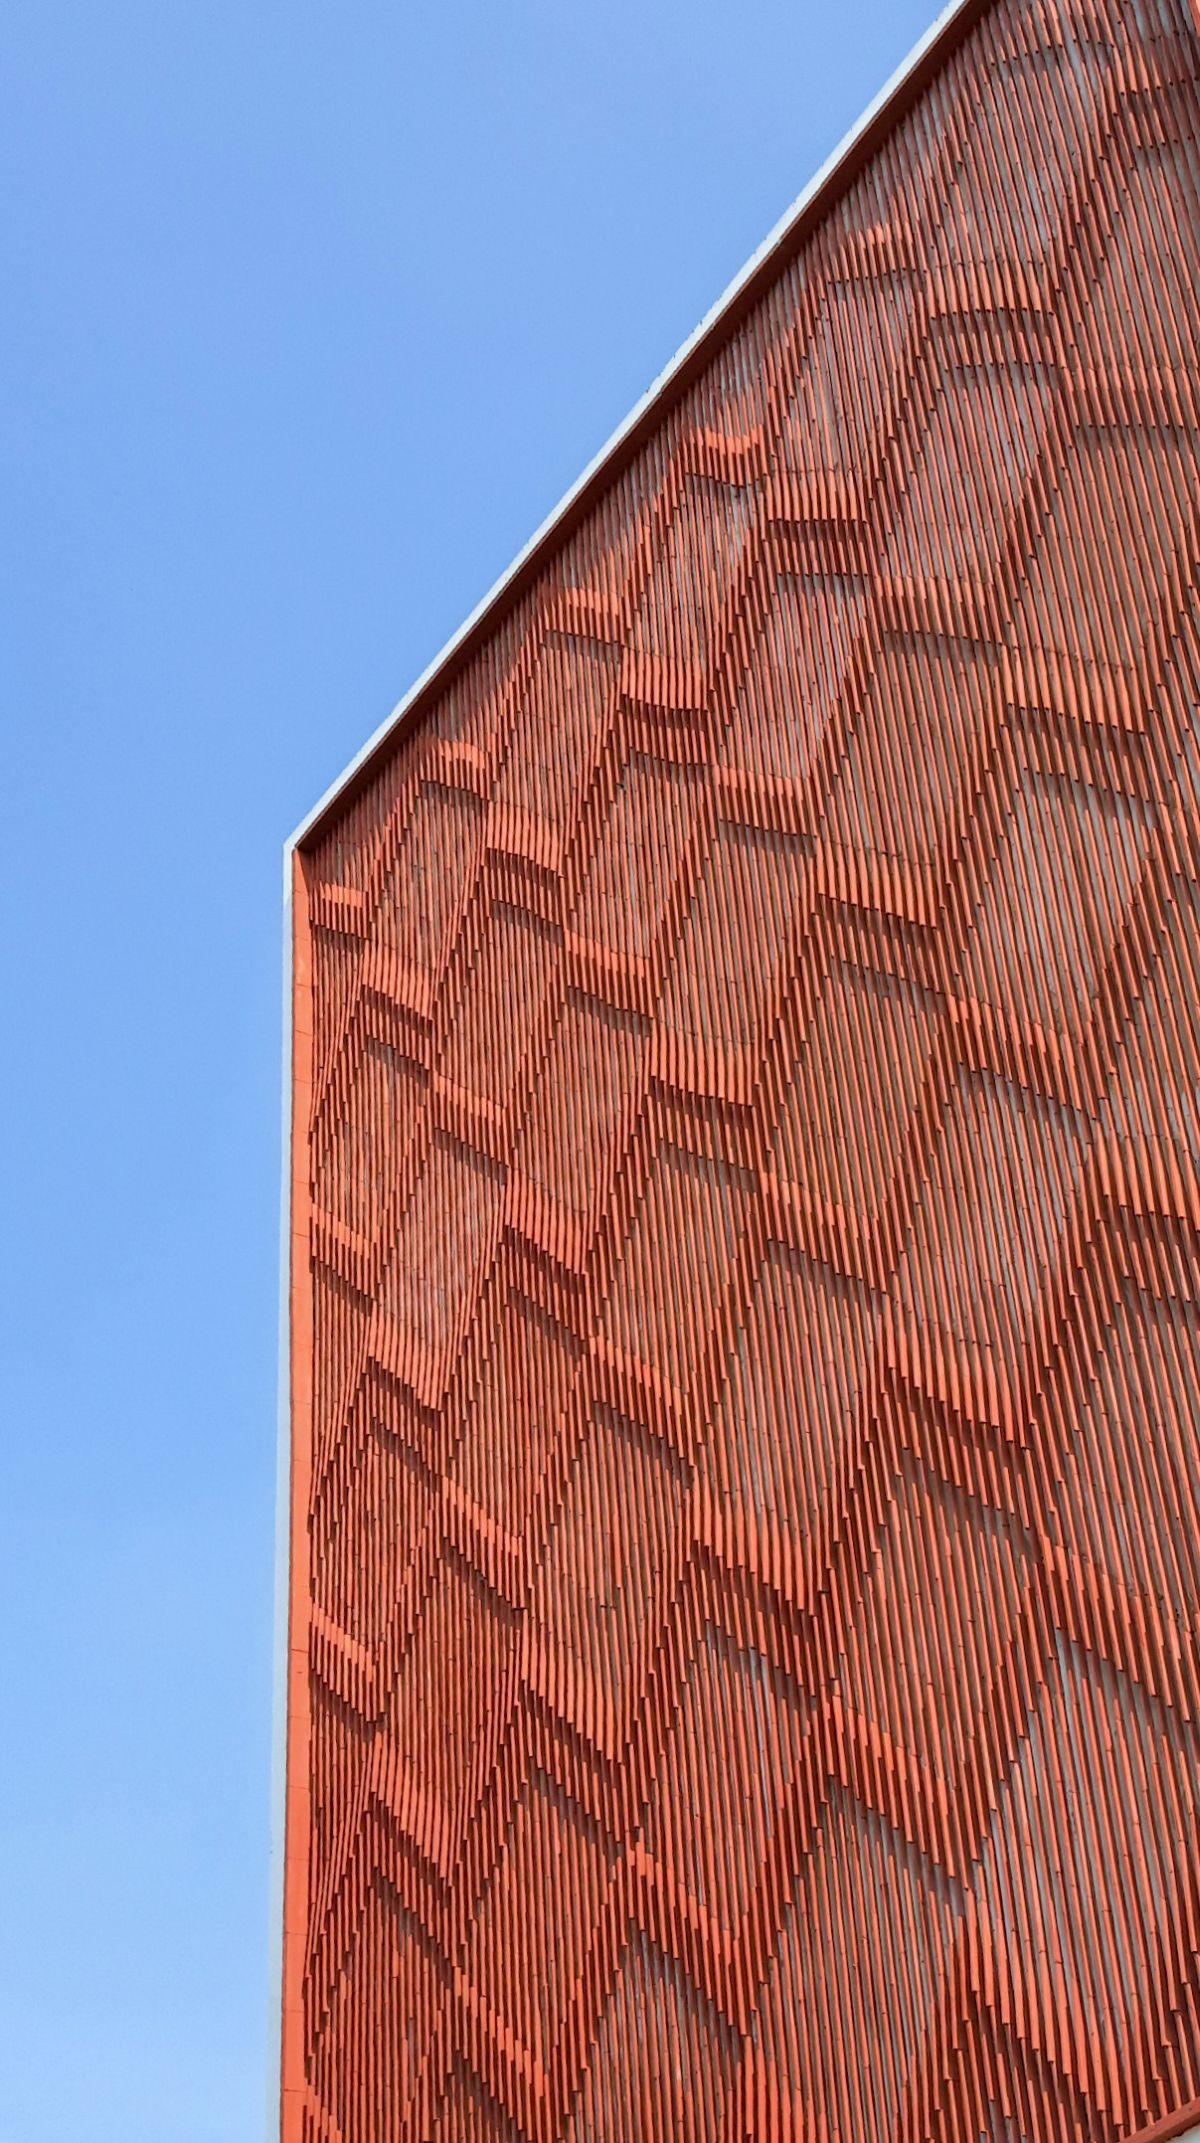 Clay roof tiles façade to minimize heat gain and has decorative function, at Vadodara, by Manoj Patel Design Studio 74